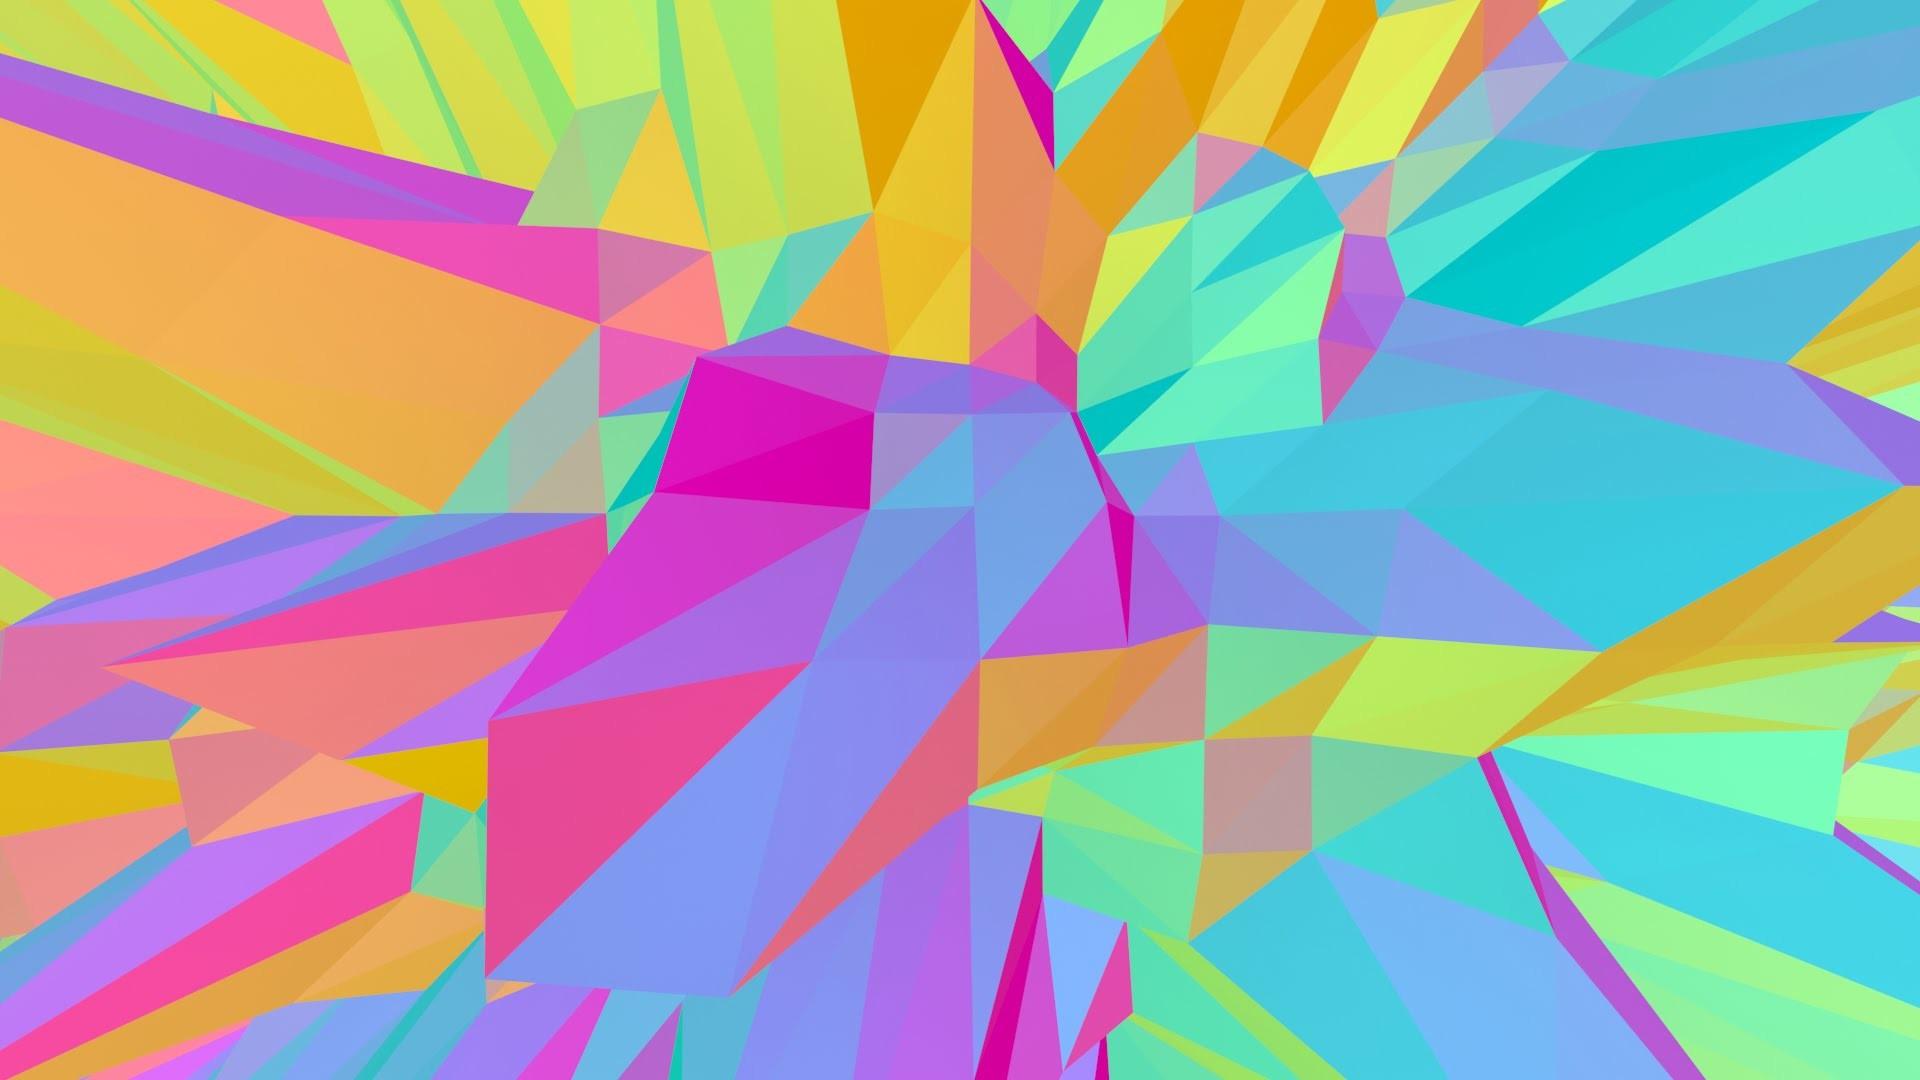 rainbow heart background 39 images